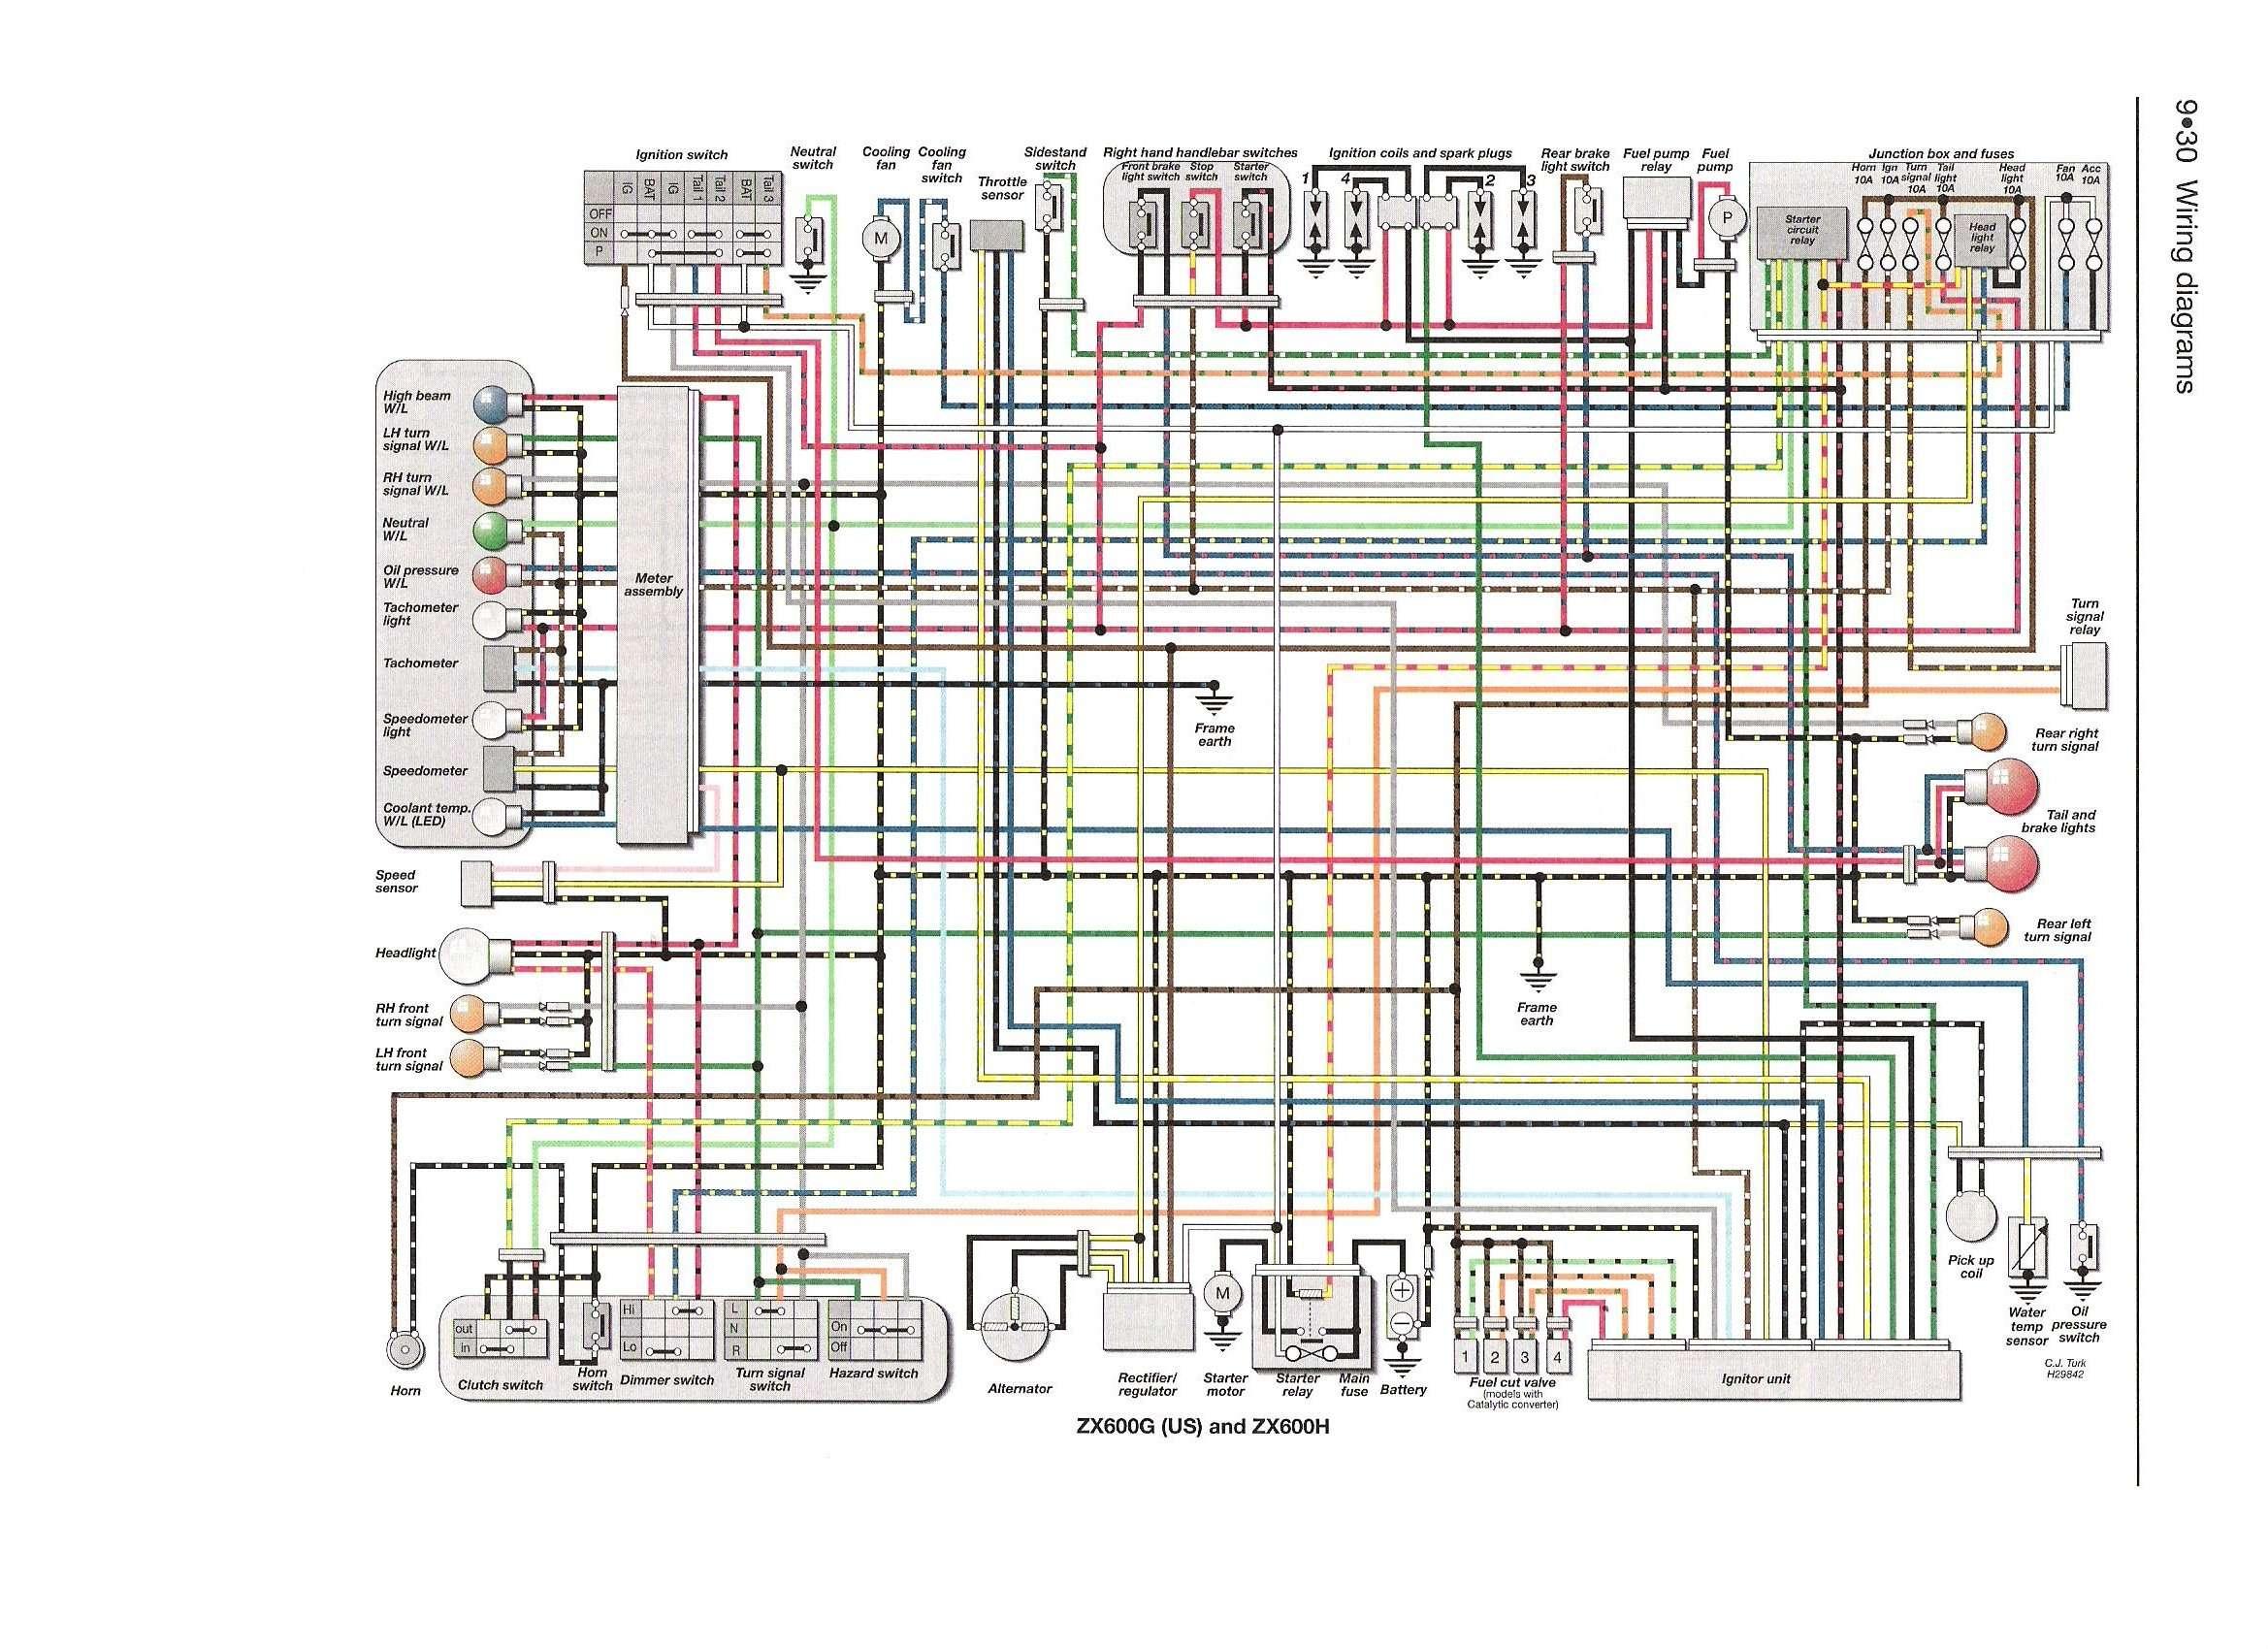 2006 Kawasaki Zx6r Wiring | Wiring Diagram on